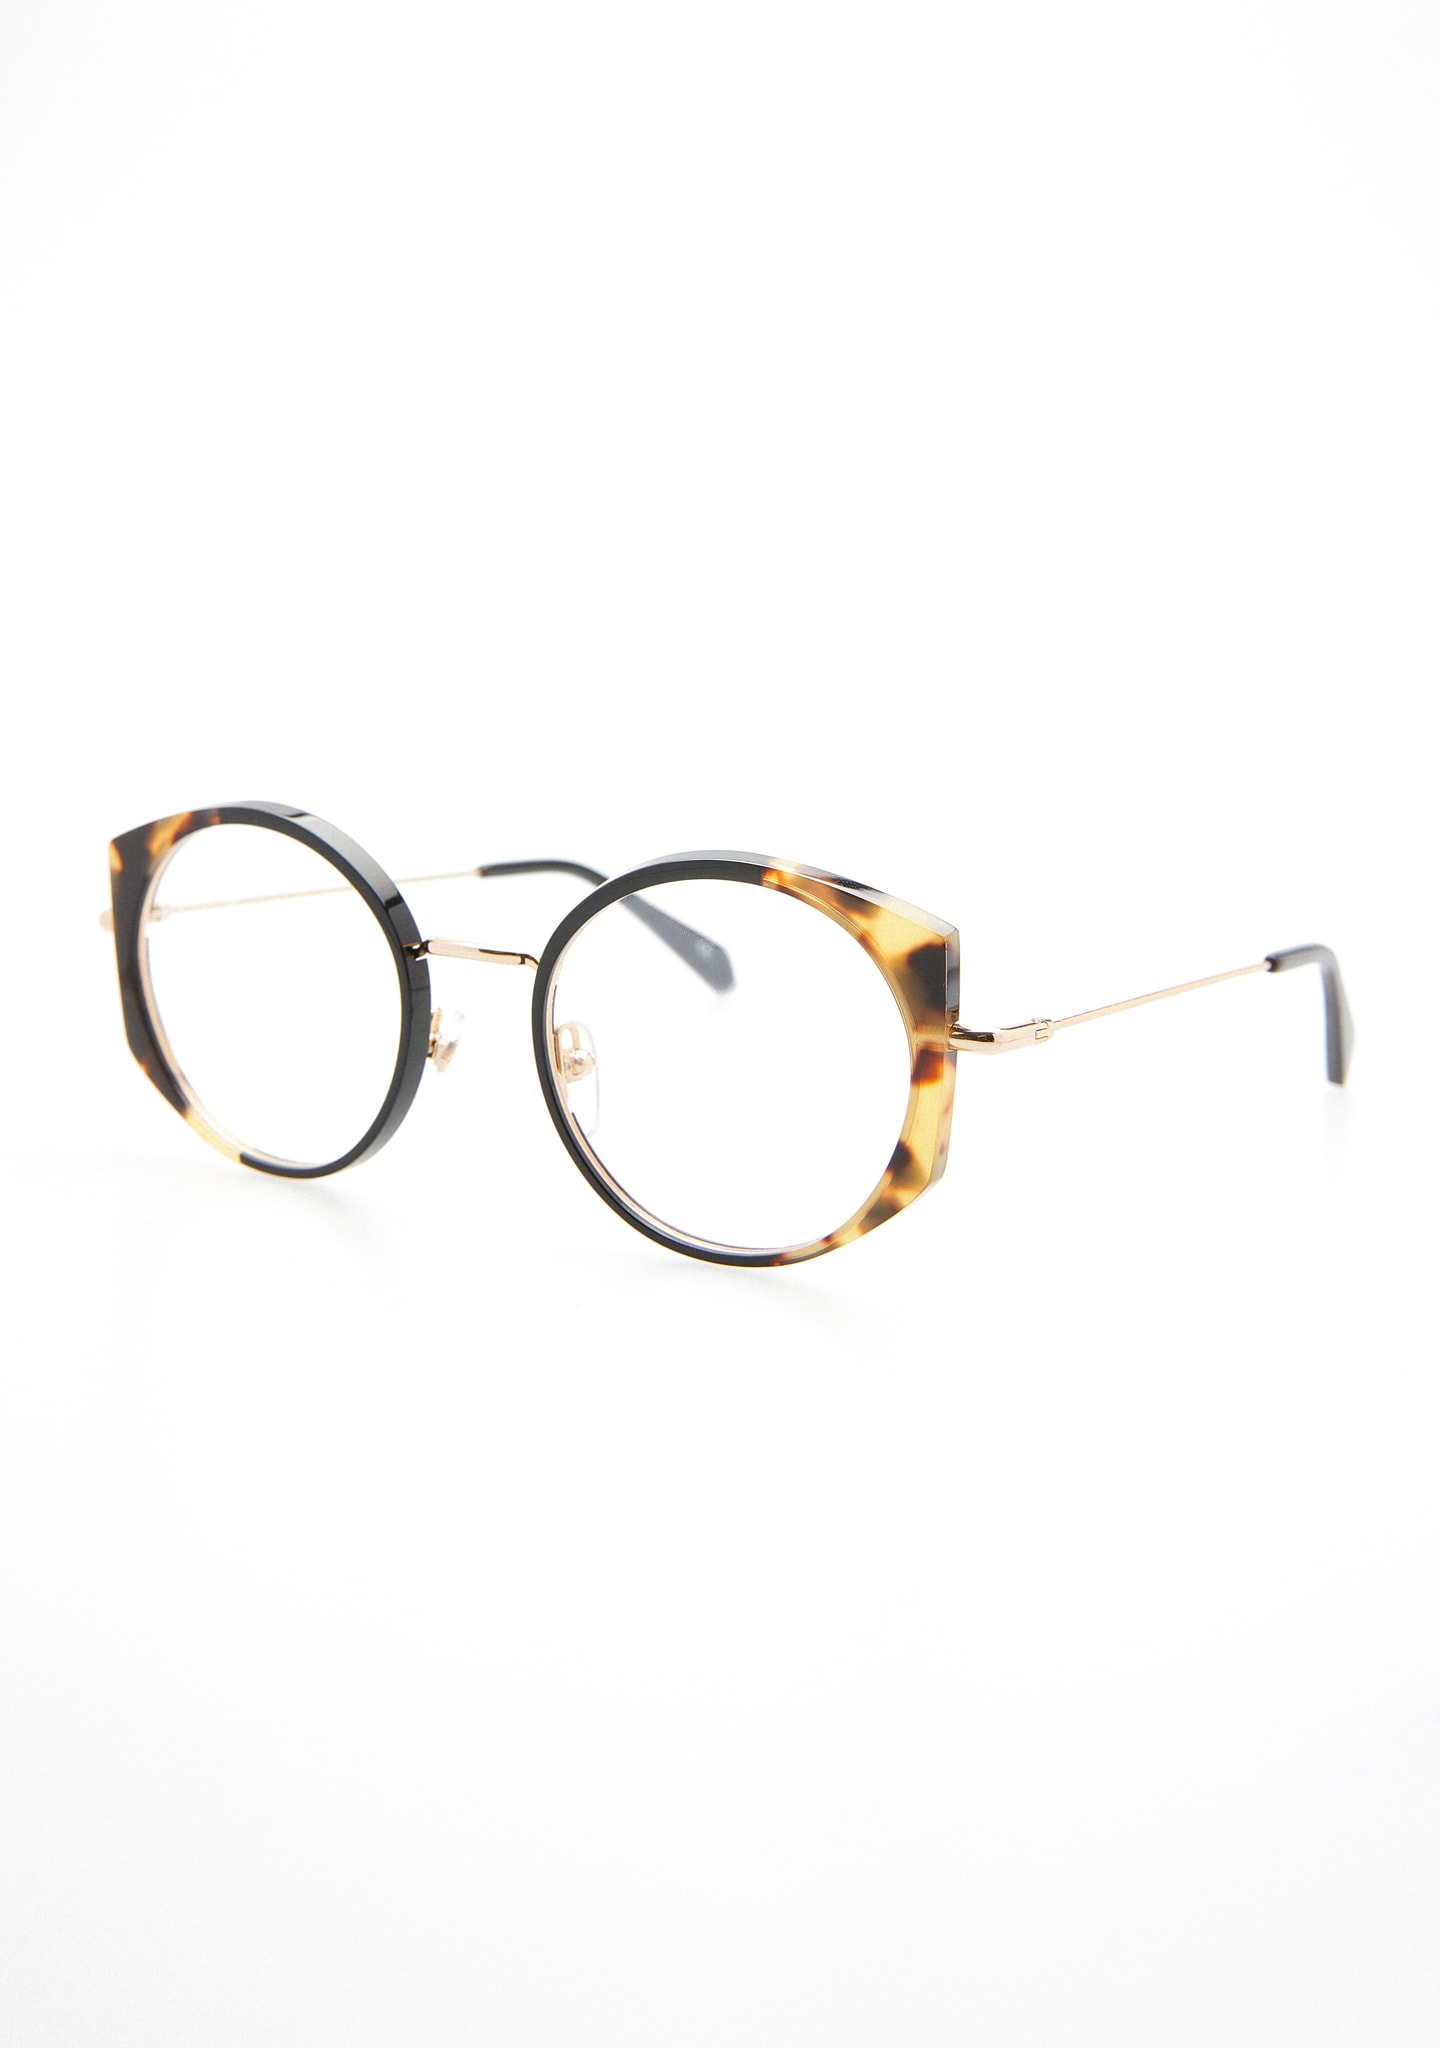 Ottico-Roggero-occhiale-vista-Kaleos-Thrombey-